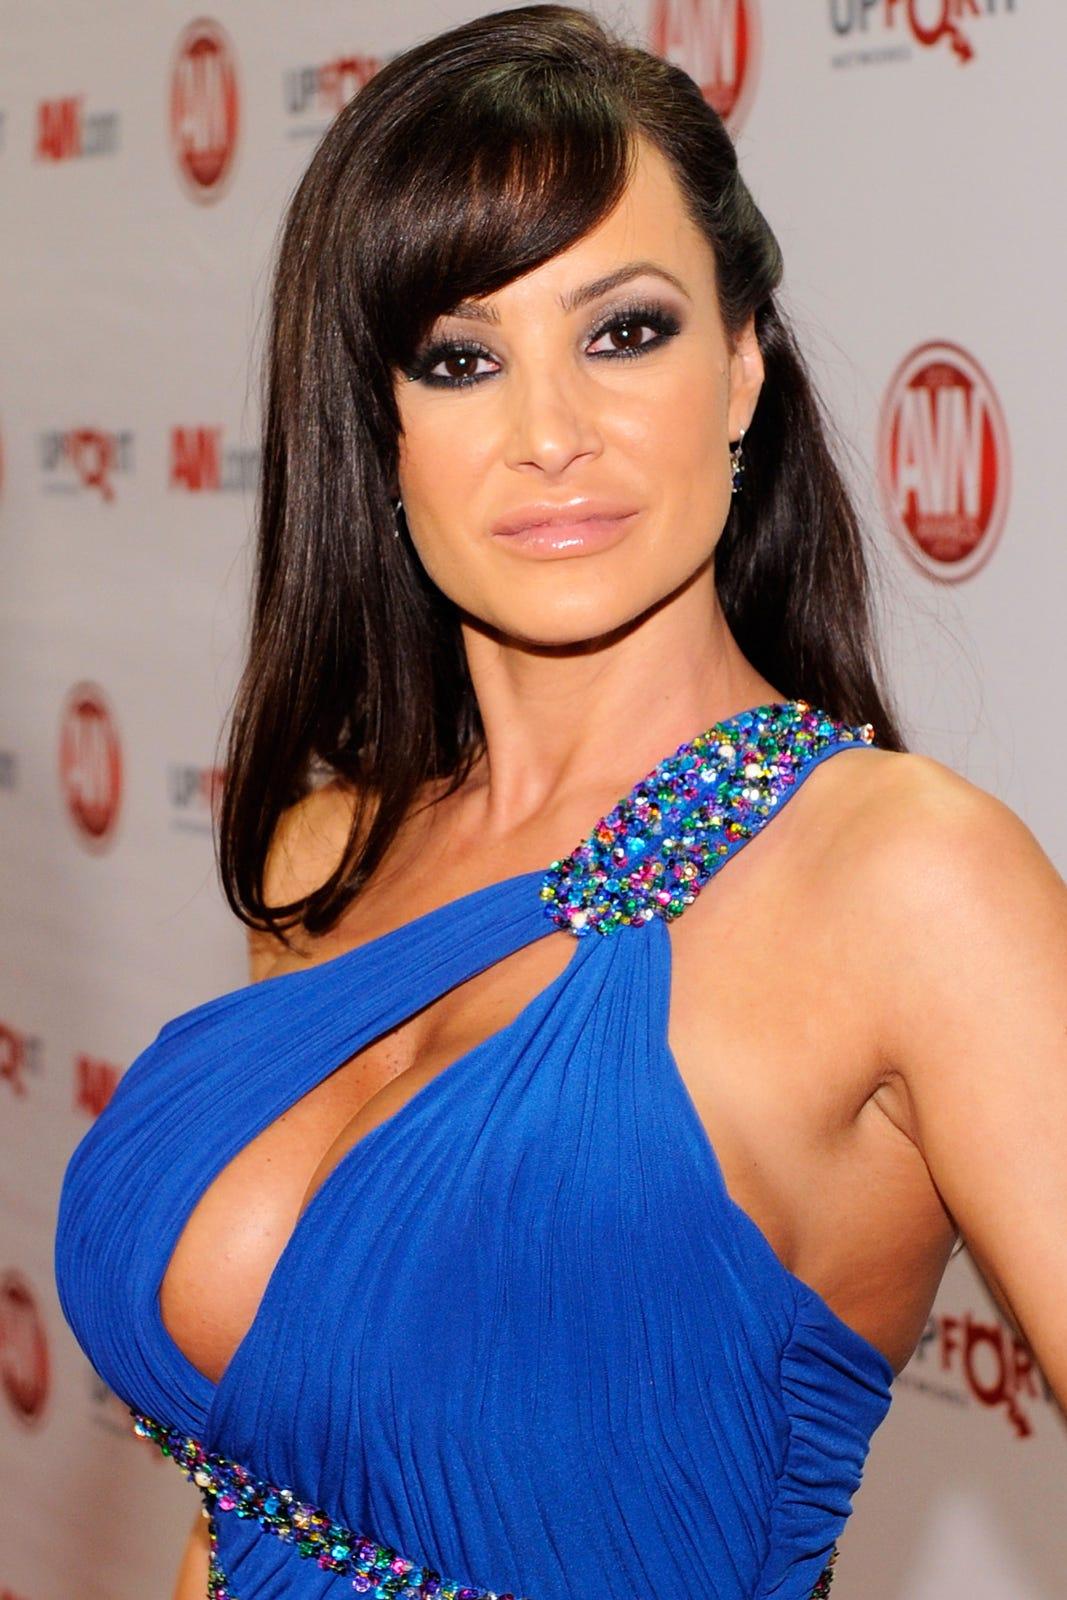 Horny latina craves cock in latina porn